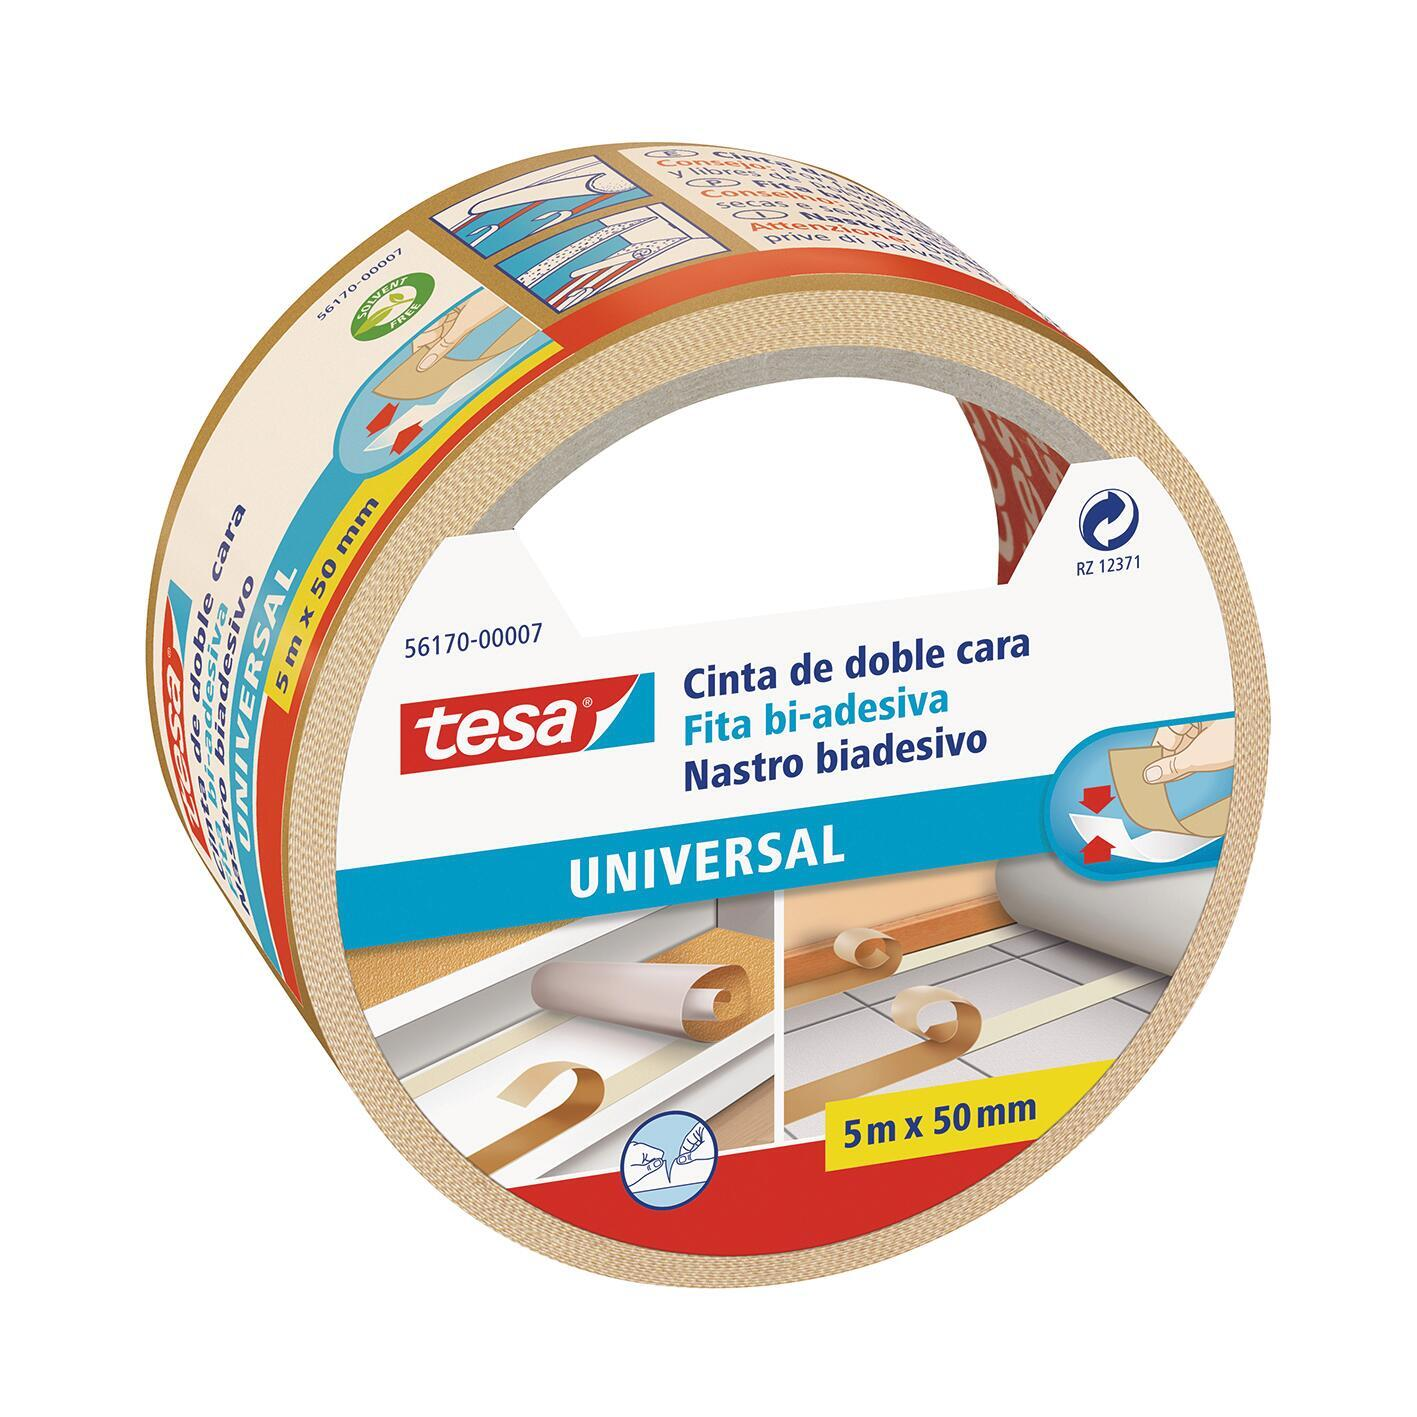 Nastro bi-adesivo TESA TAPE Biadesivo universale filmico 5 m x 50 mm bianco - 1